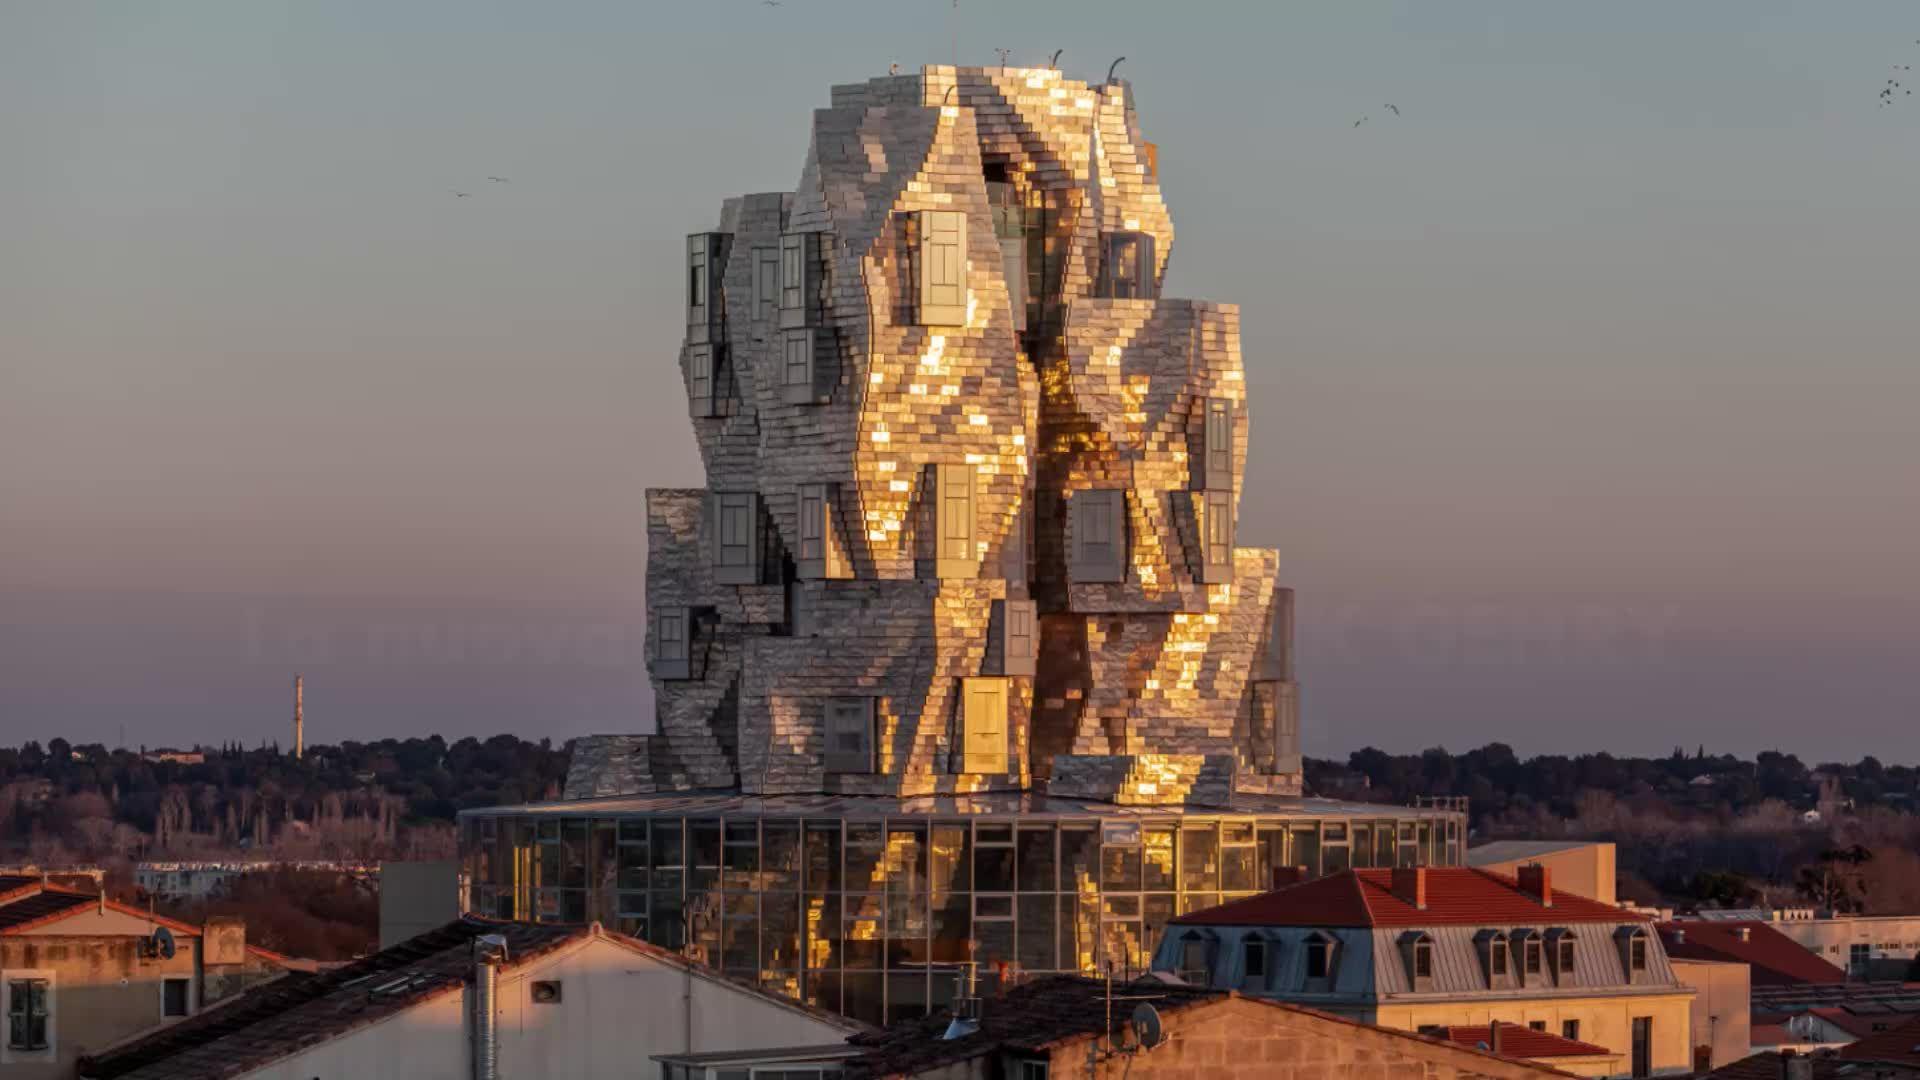 Torre Arles, l'ultima opera di Gehry nel nuovo parco delle arti francese